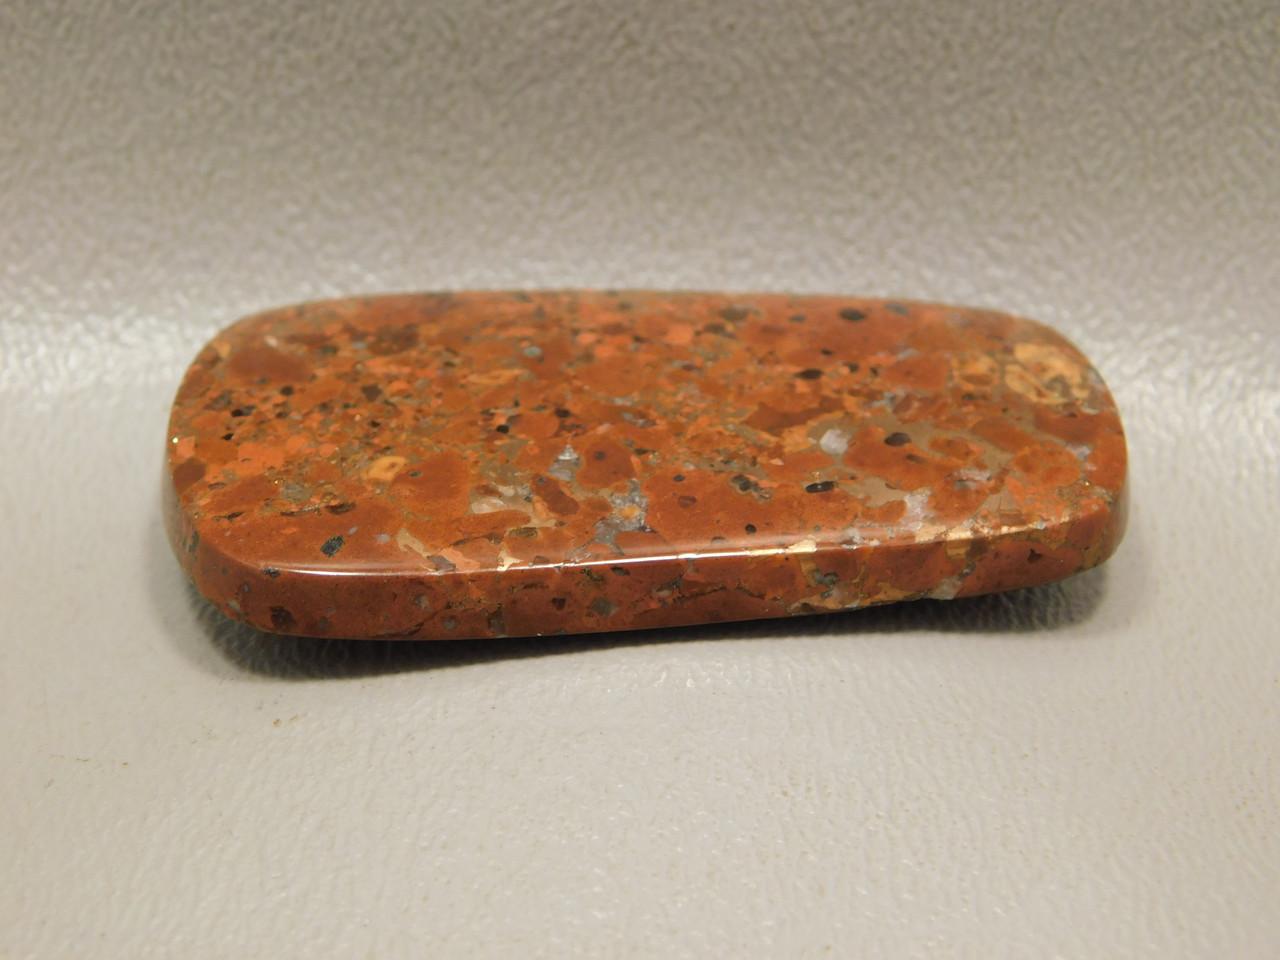 Cabochon Copper Rose Native Copper Stone Natural Rare Gemstone 4